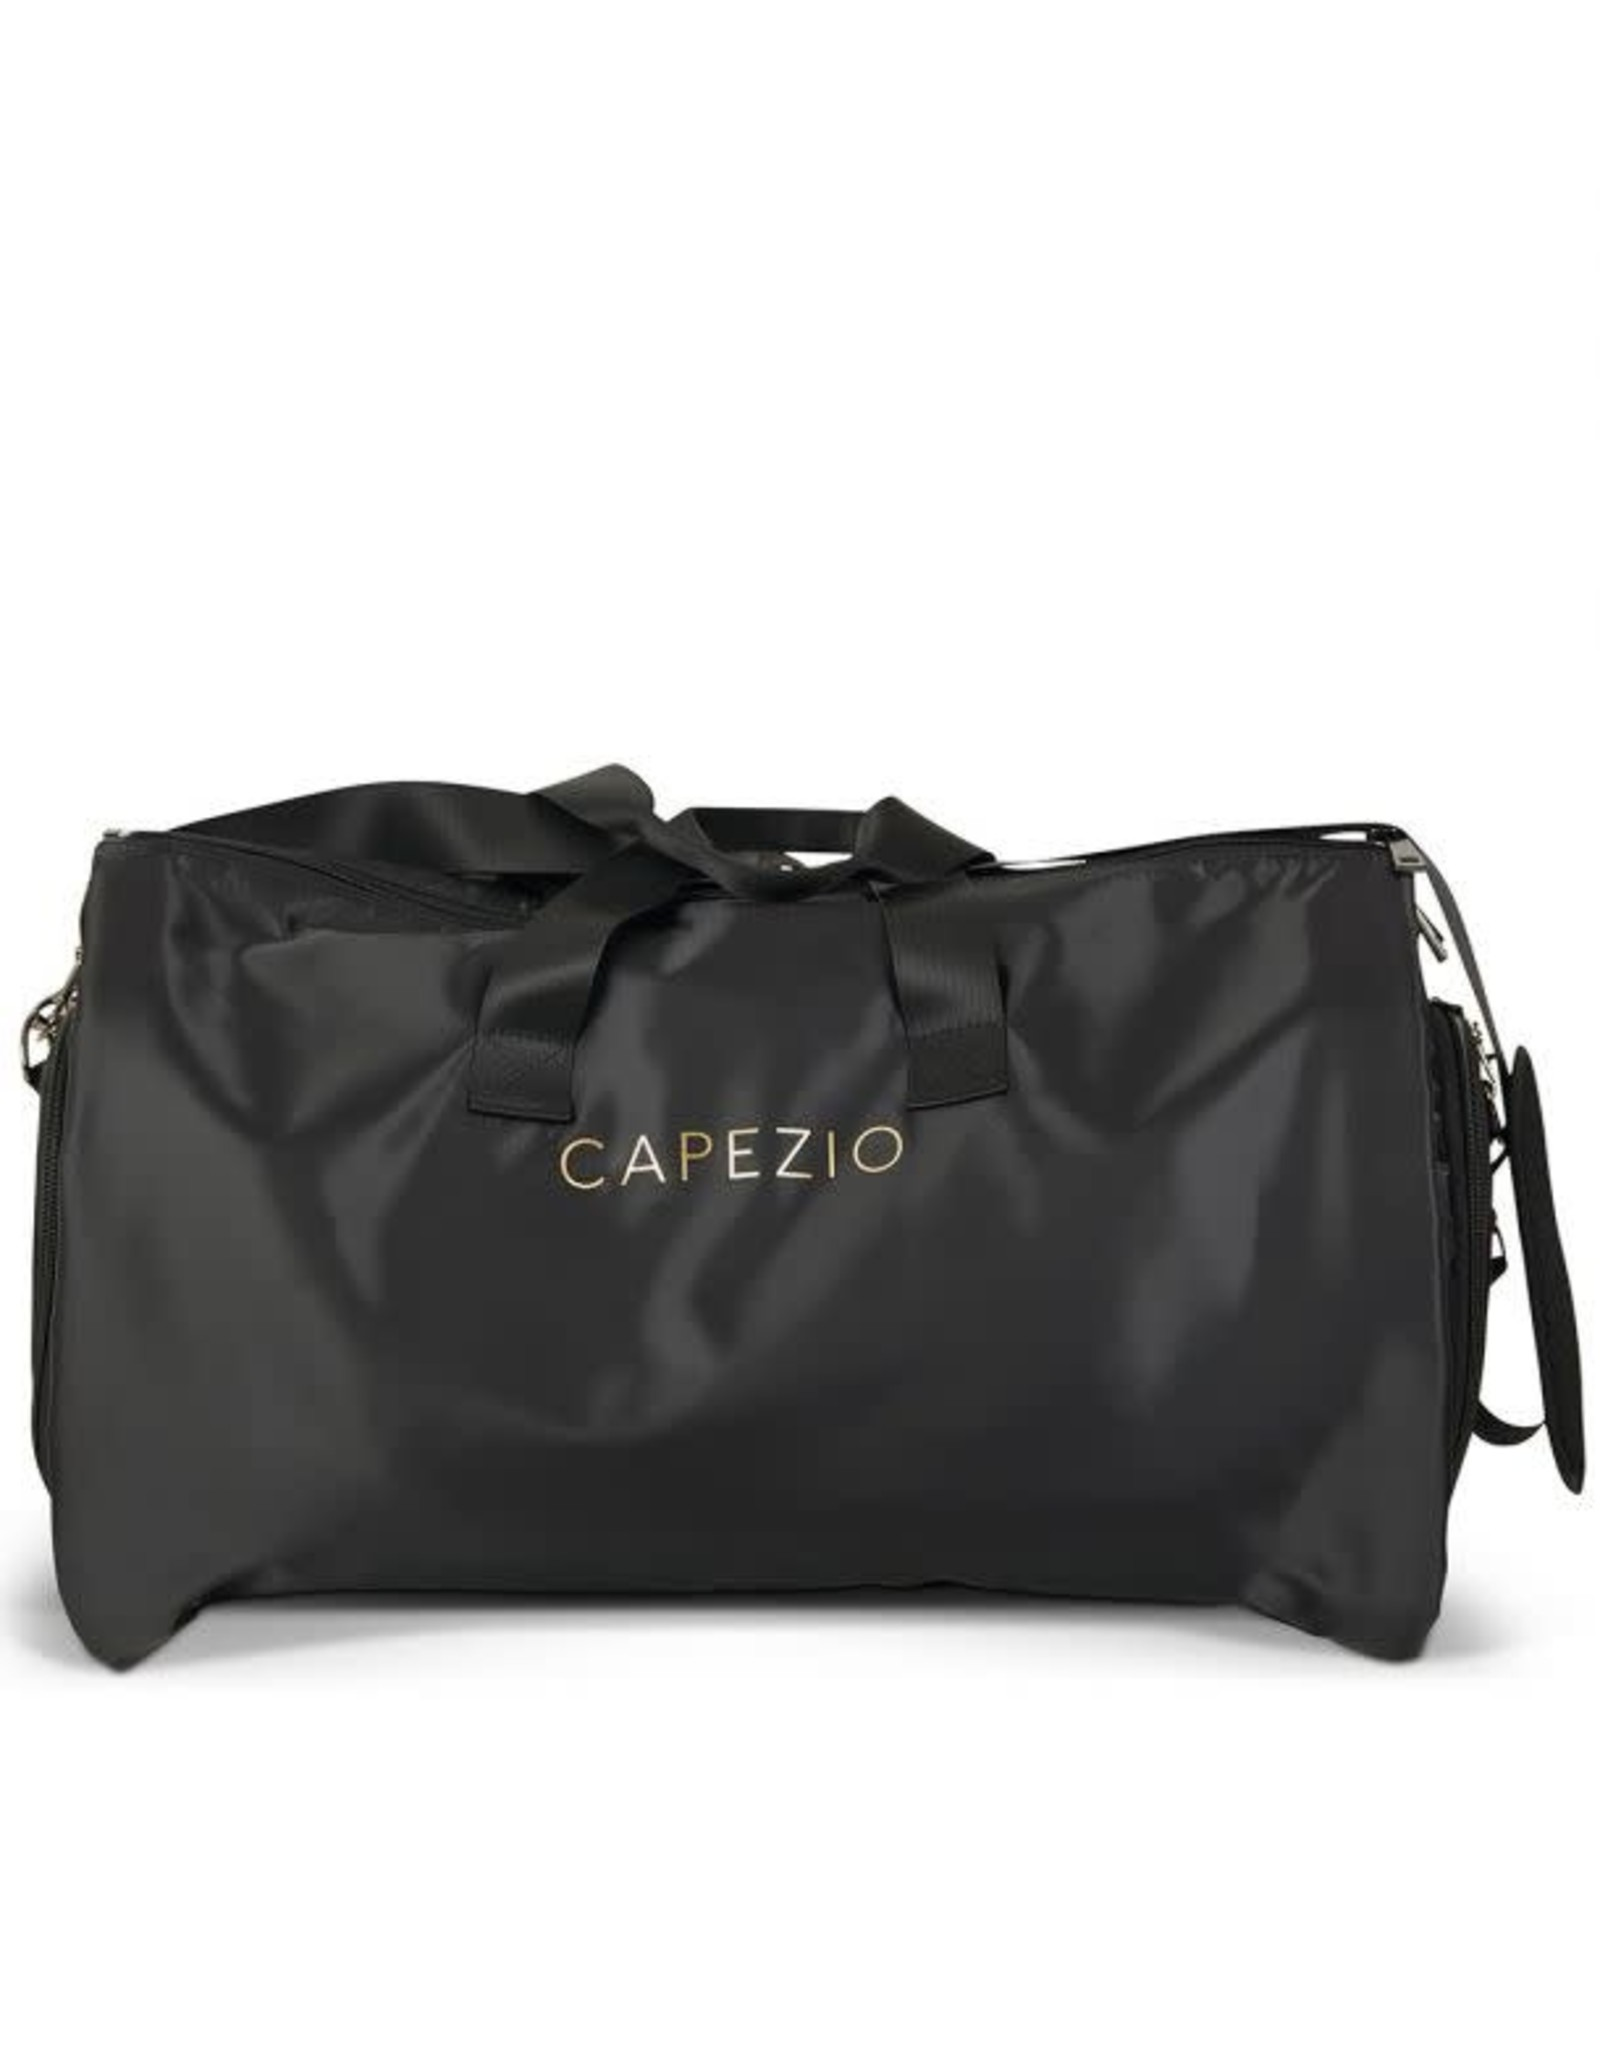 Capezio Dance Garment Duffle